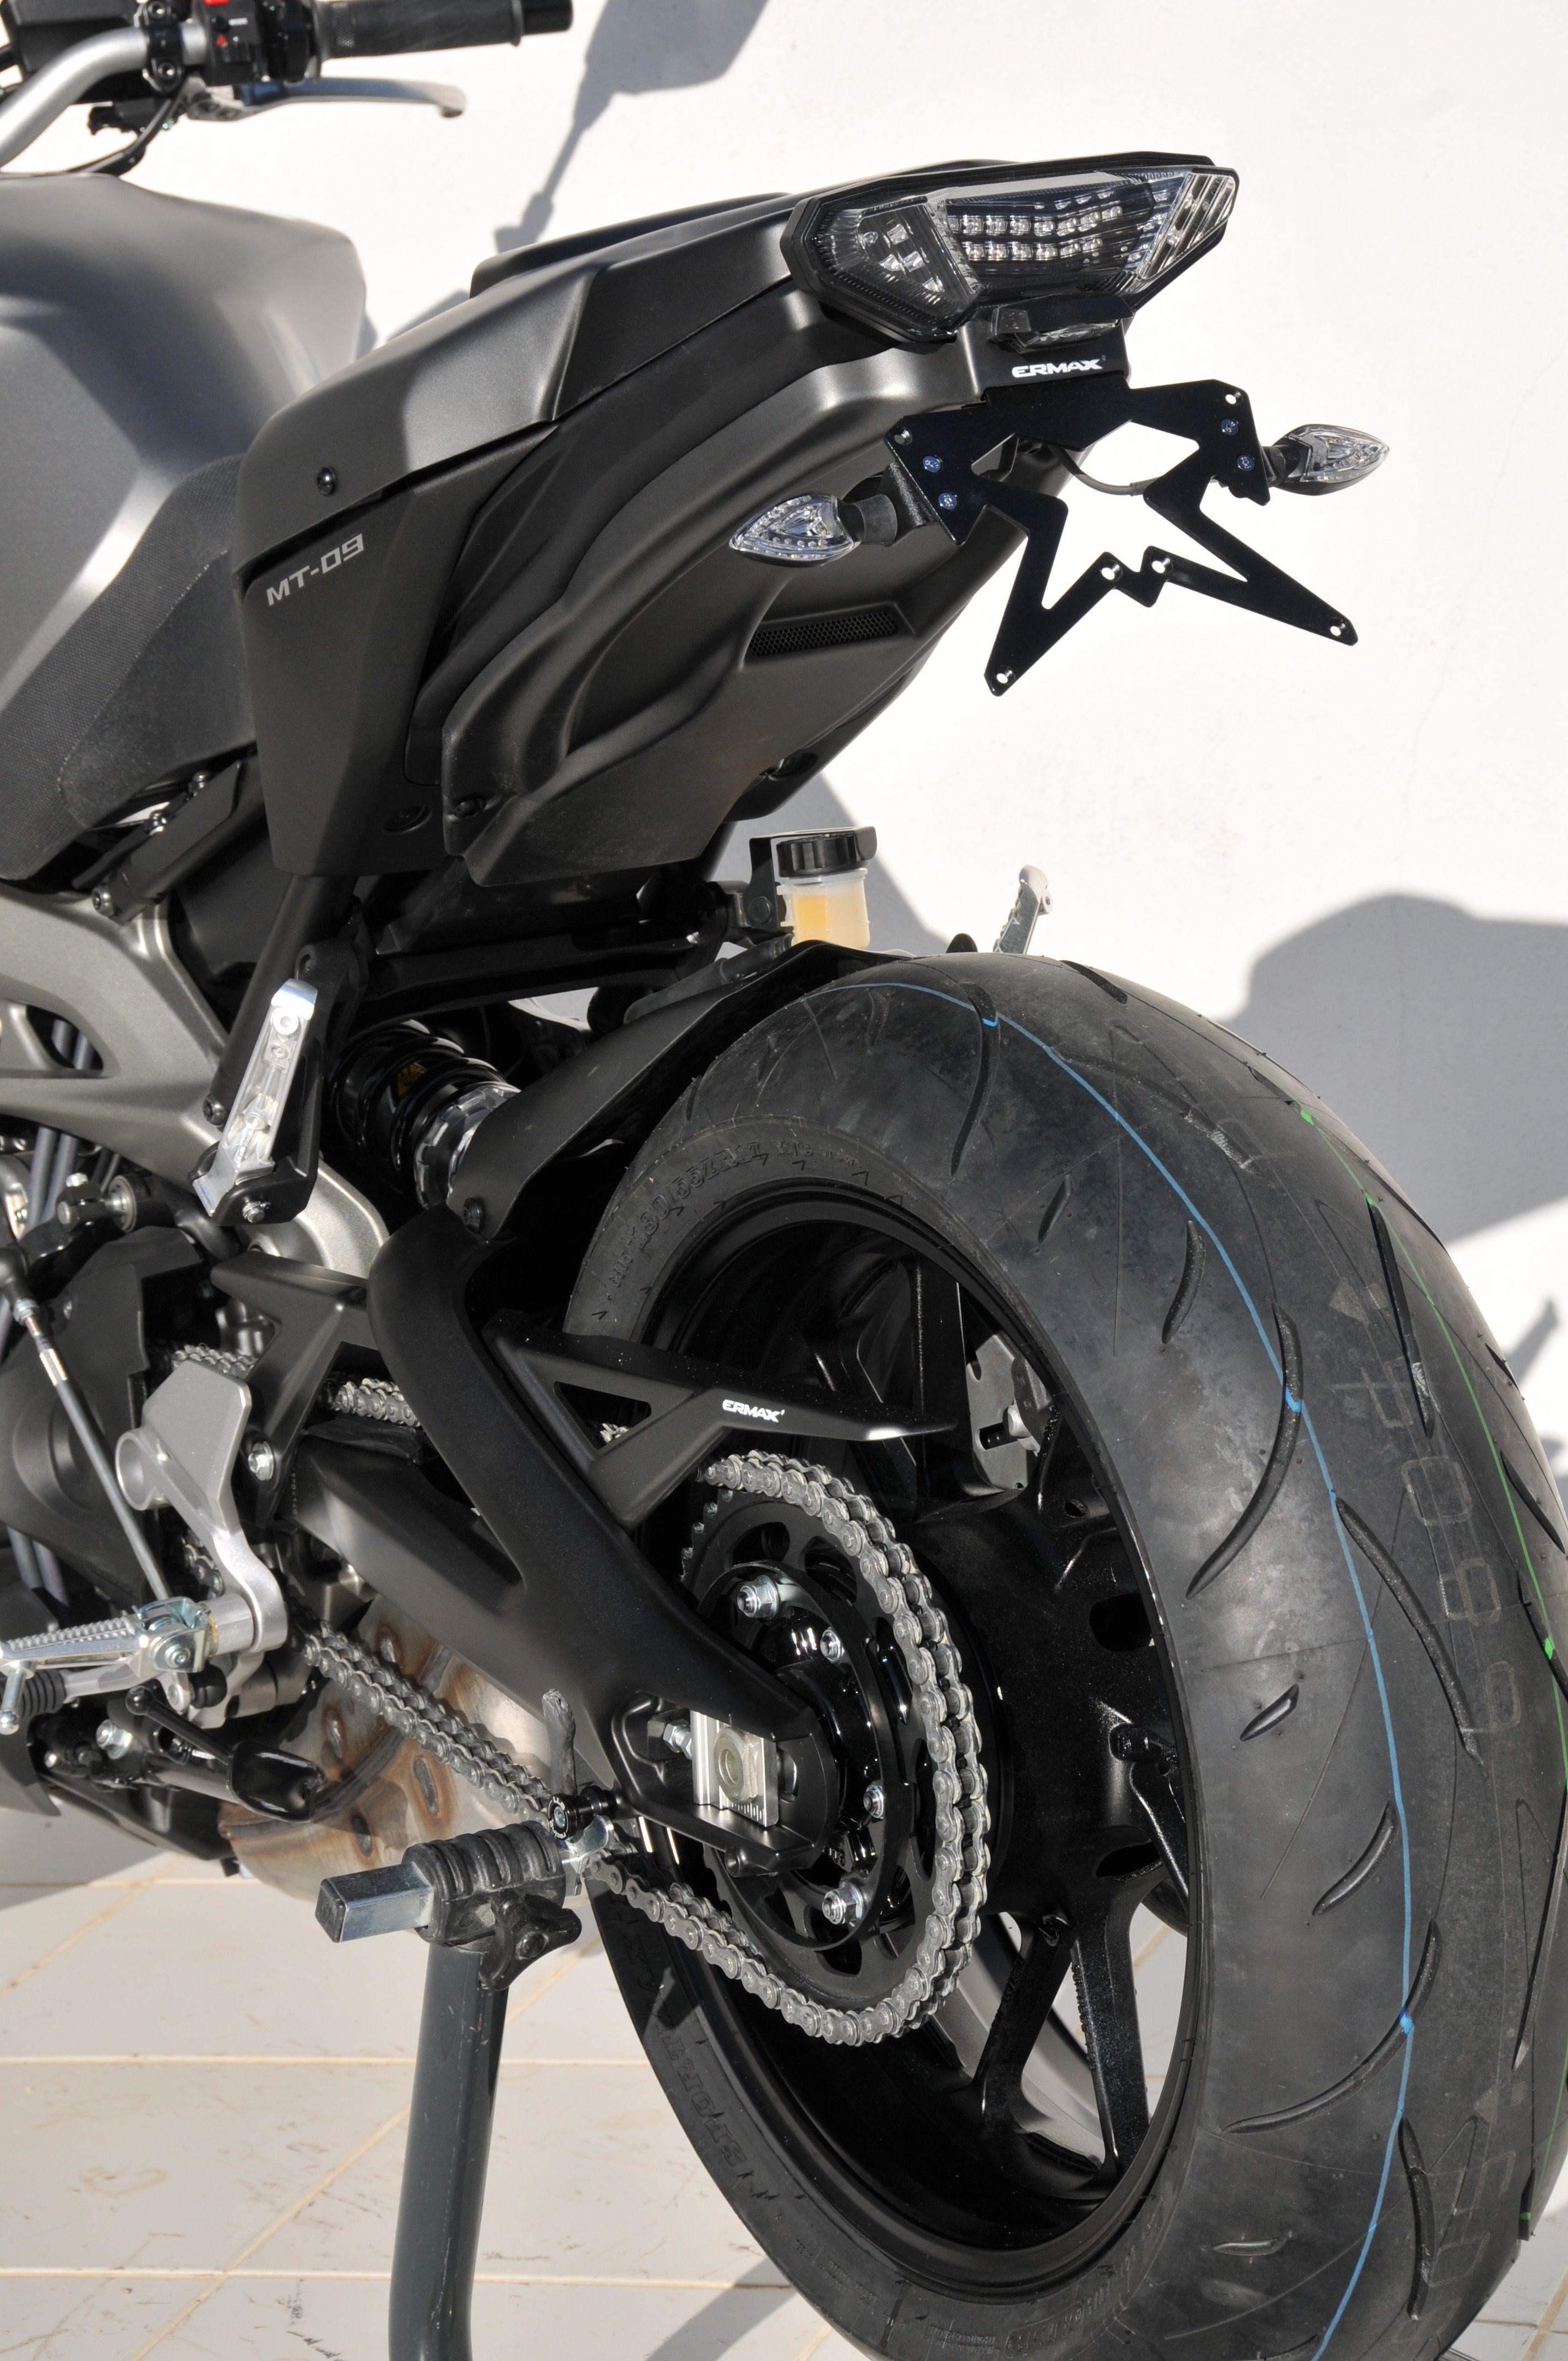 Moto yamaha scrambler cars motorcycles bobber forward mt09 yamaha - Yamaha Mt 09 13 Tail Tidy Licence Plate Holder Lp0153bk Bike Pinterest Licence Plates Plates And Plate Holder